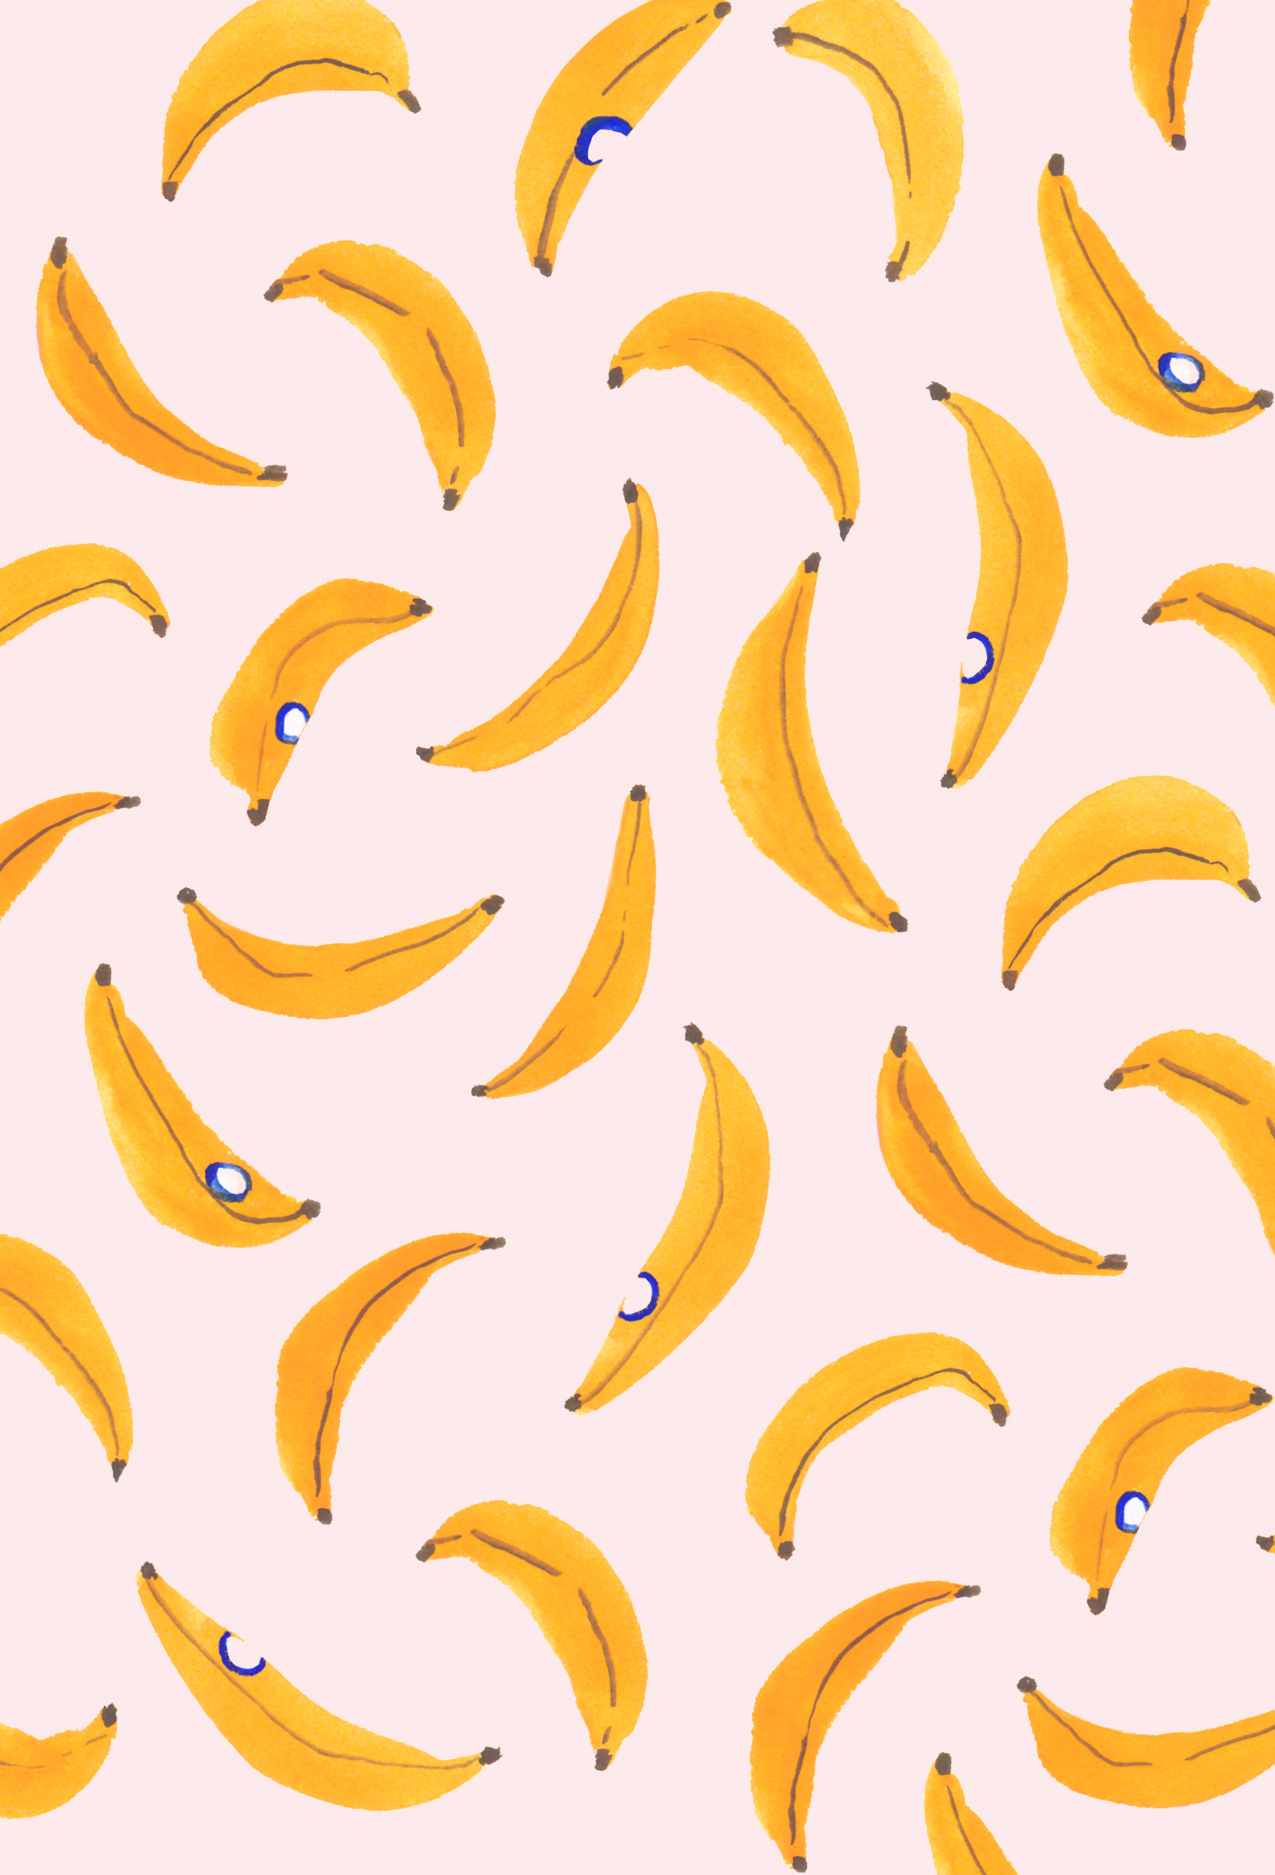 postcard_bananas.jpg